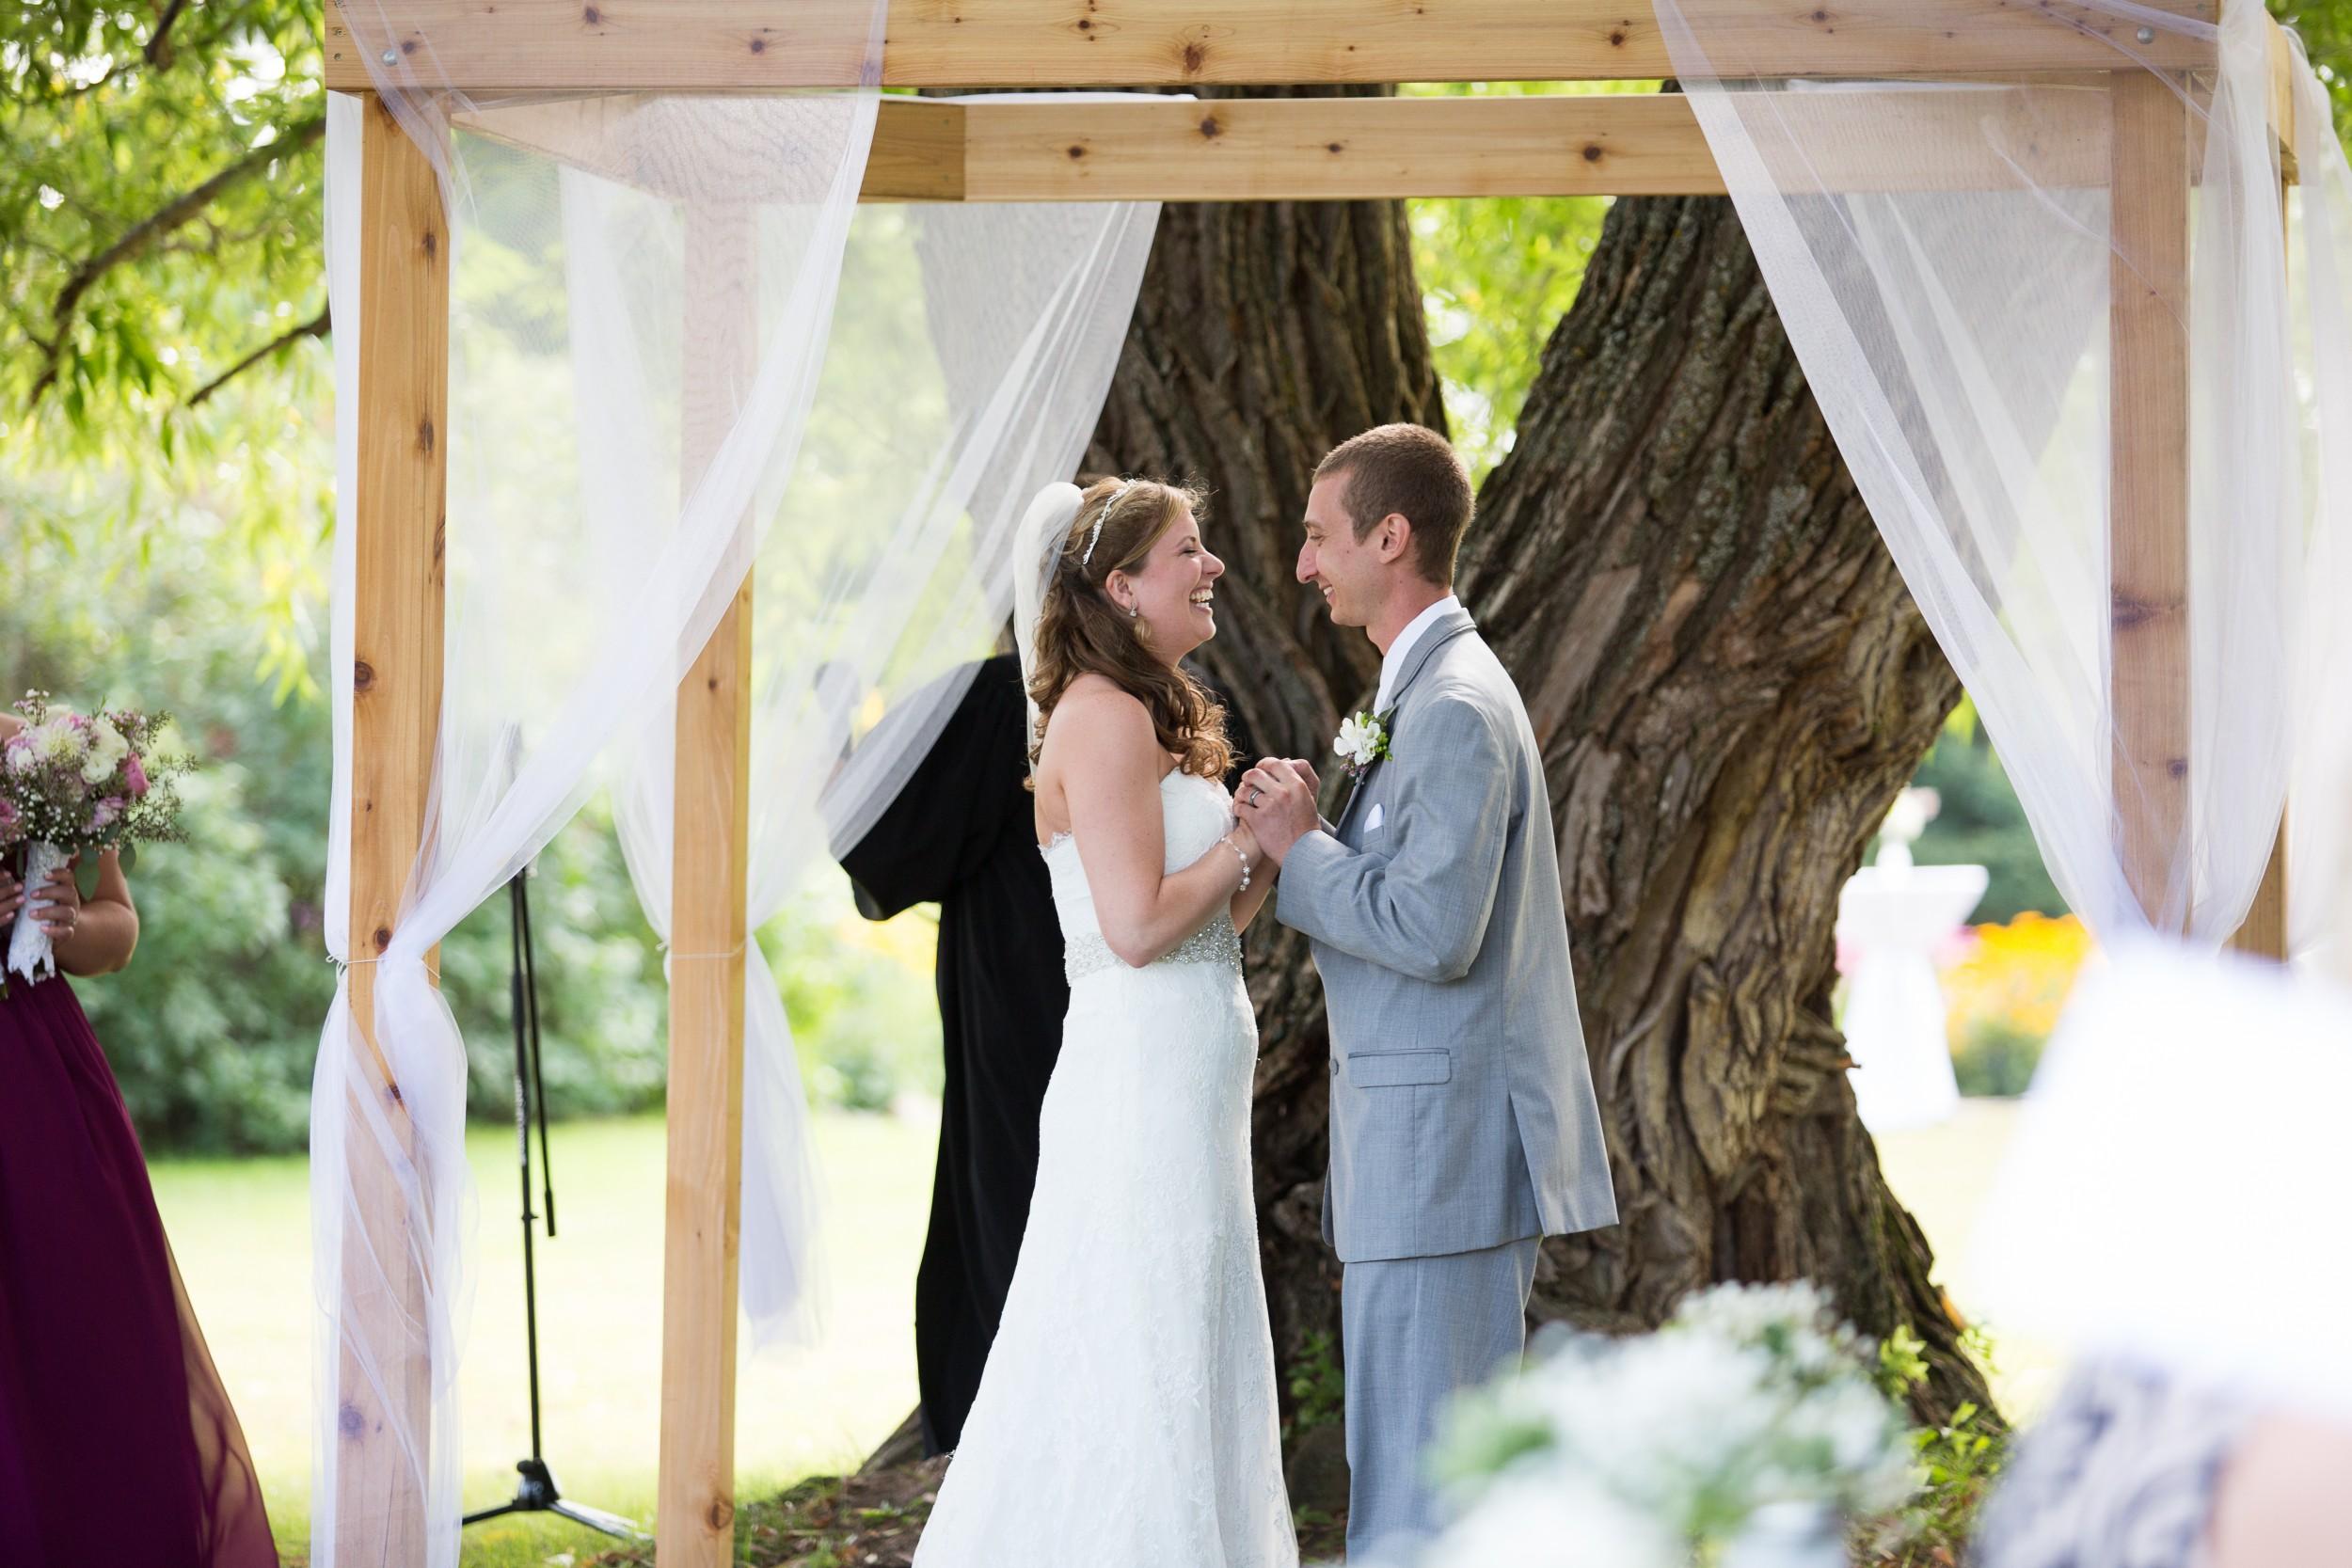 Brule River Barn Wedding, barn wedding, wisconsin wedding photographer